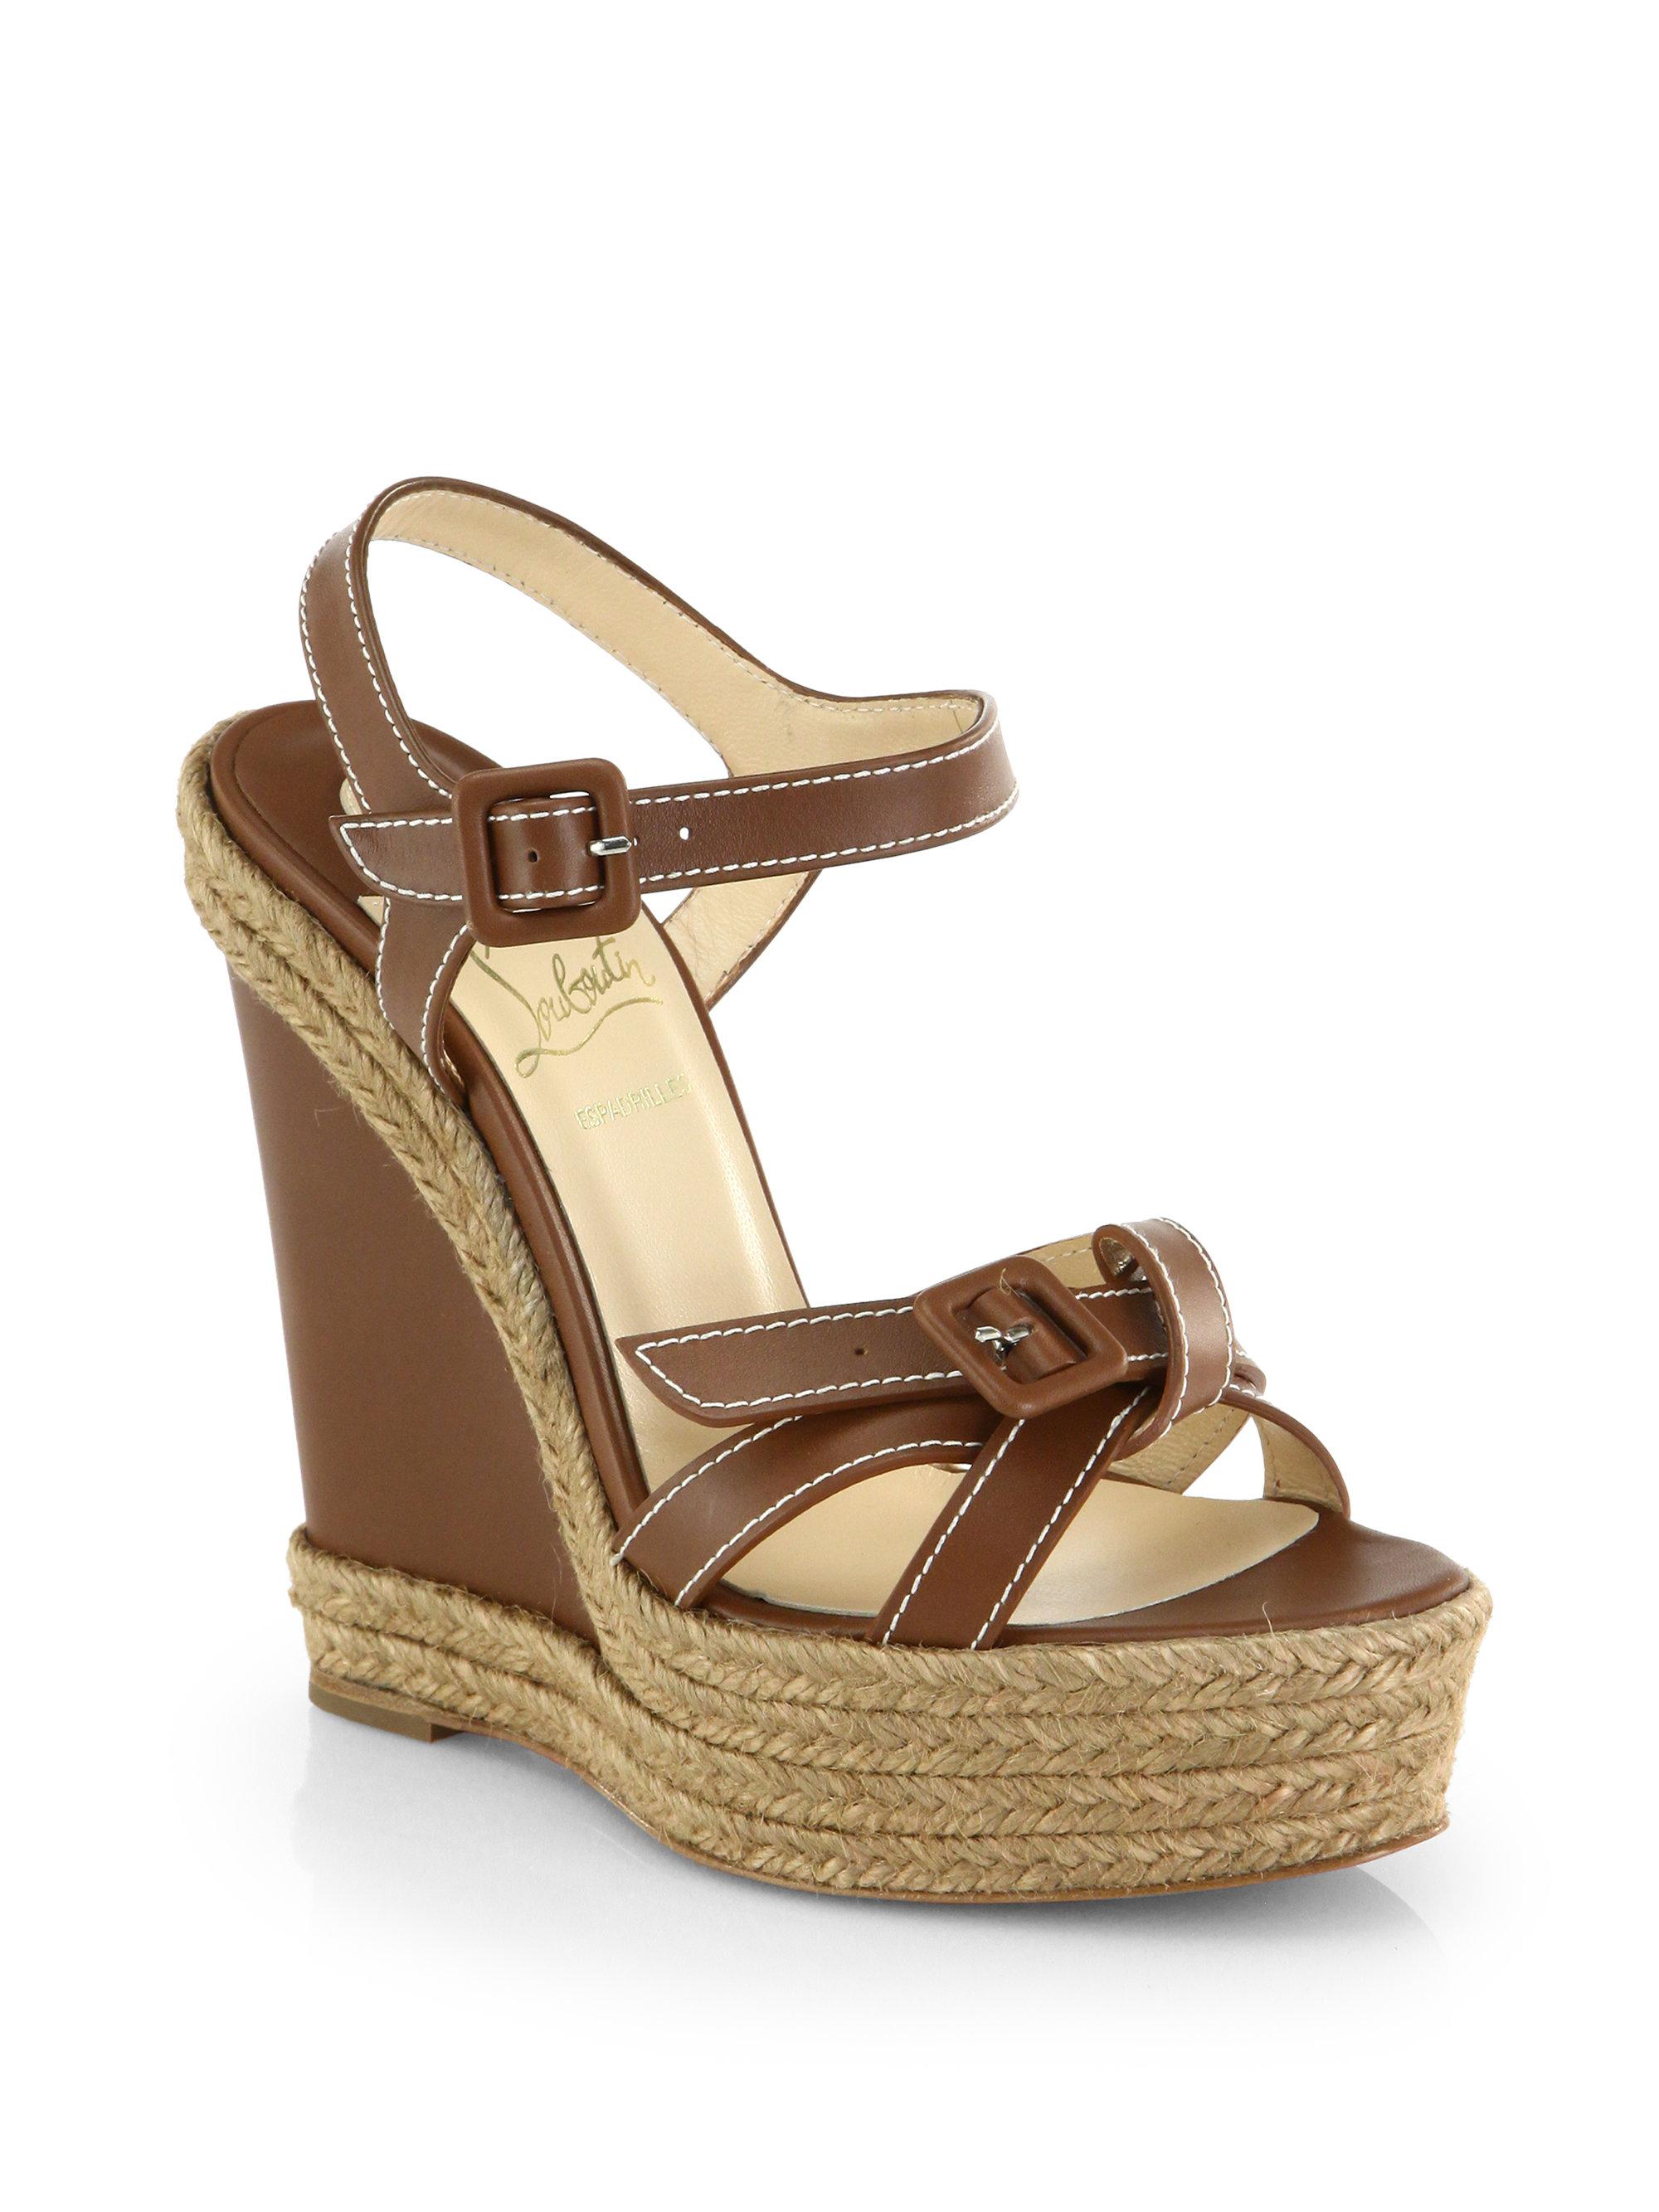 Christian Louboutin Brown Zero Problem Leather Espadrille Wedge Sandals